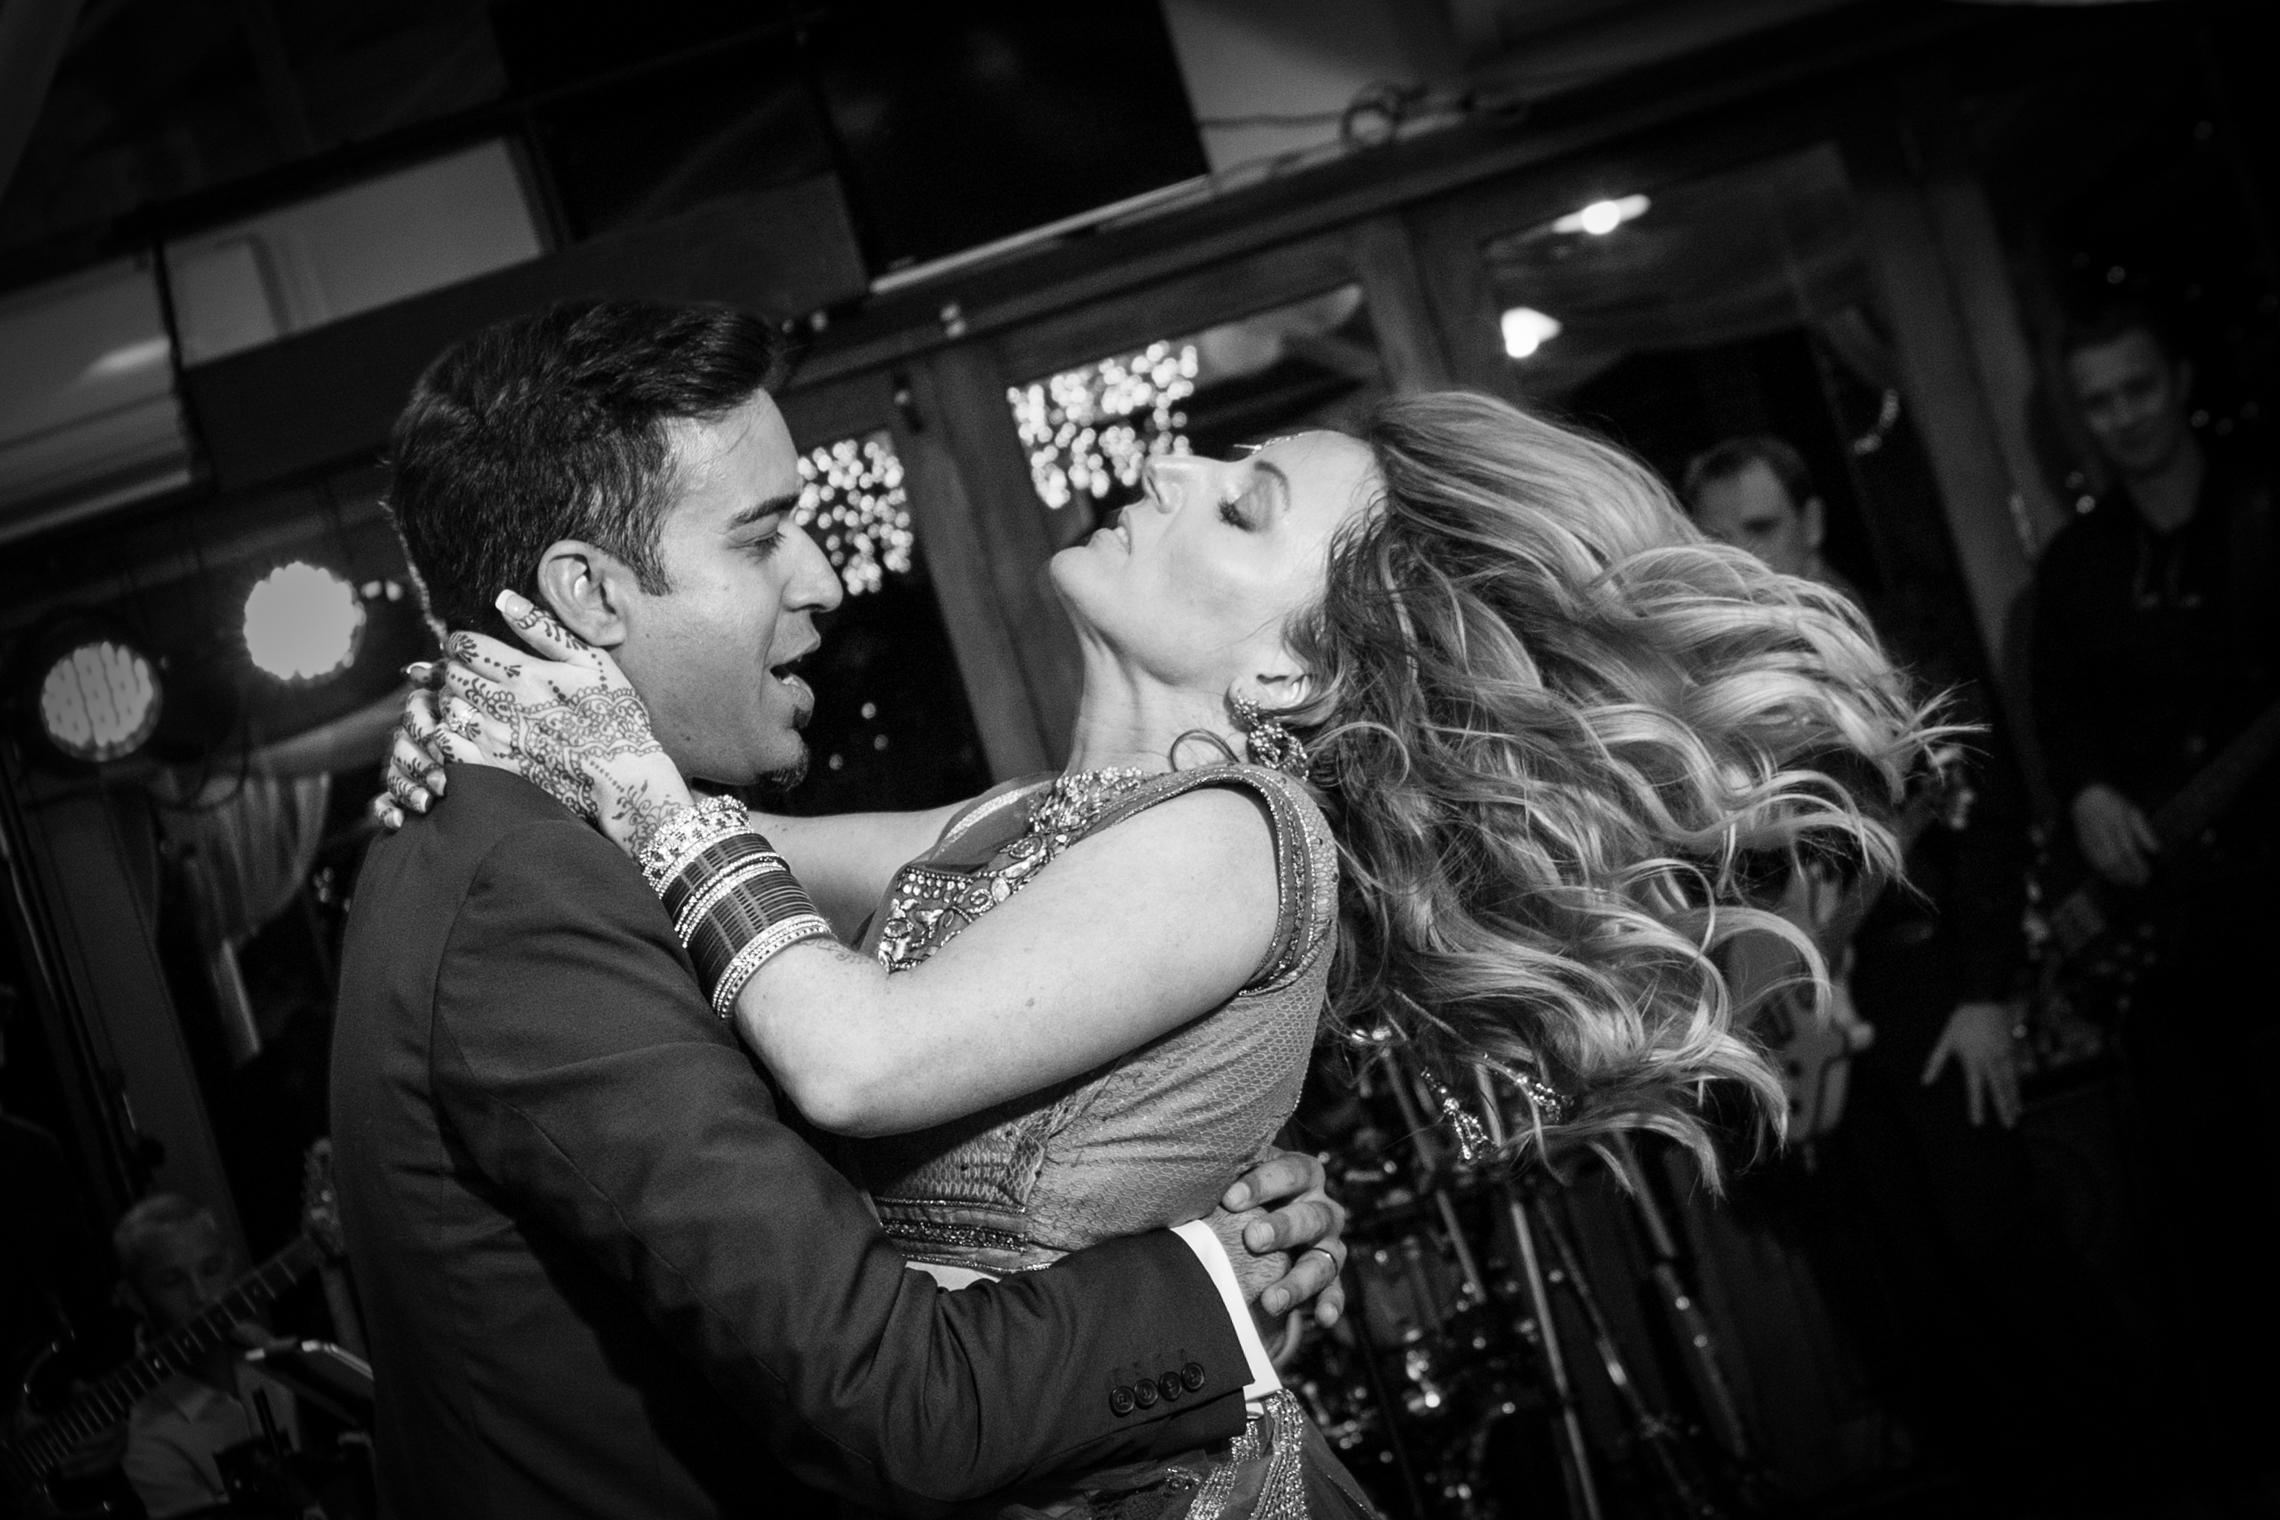 Wedding photographer Auckland testimonial-2